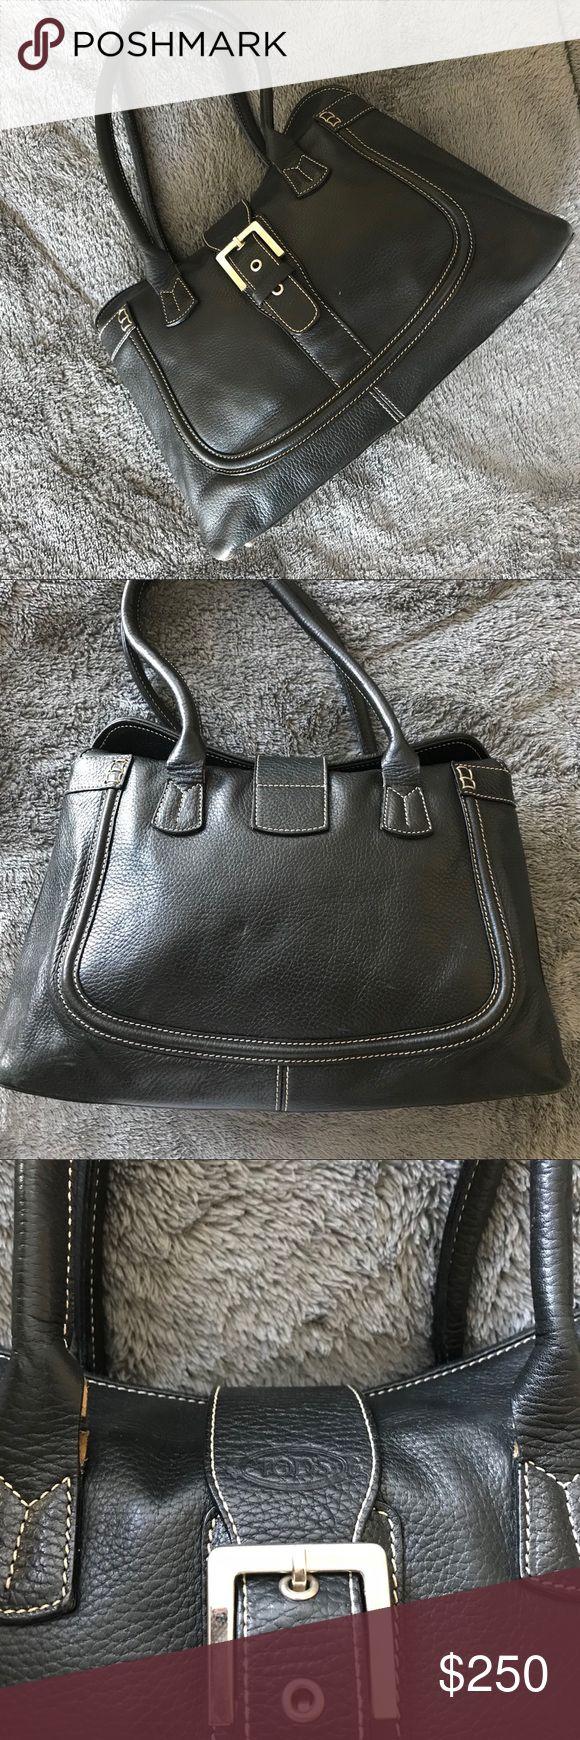 Tods Black Pebbled Leather Hobo/Shoulder Bag $1800 Preowned Tod's Bags Shoulder Bags